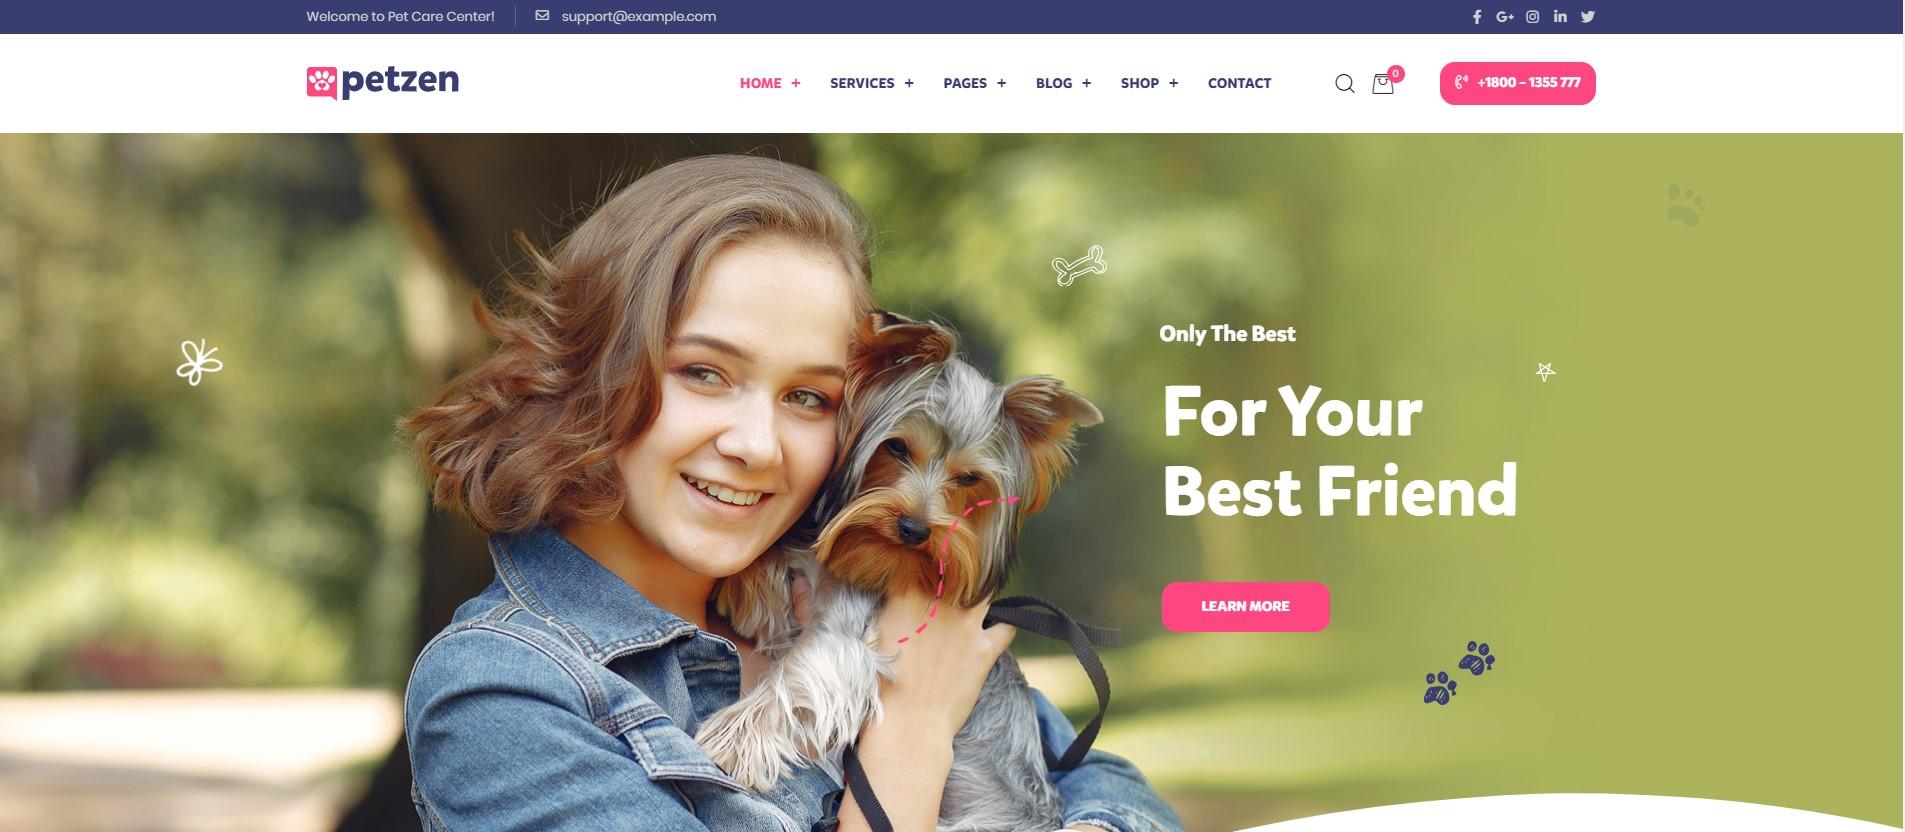 Petie Pet Care Center WordPress Theme